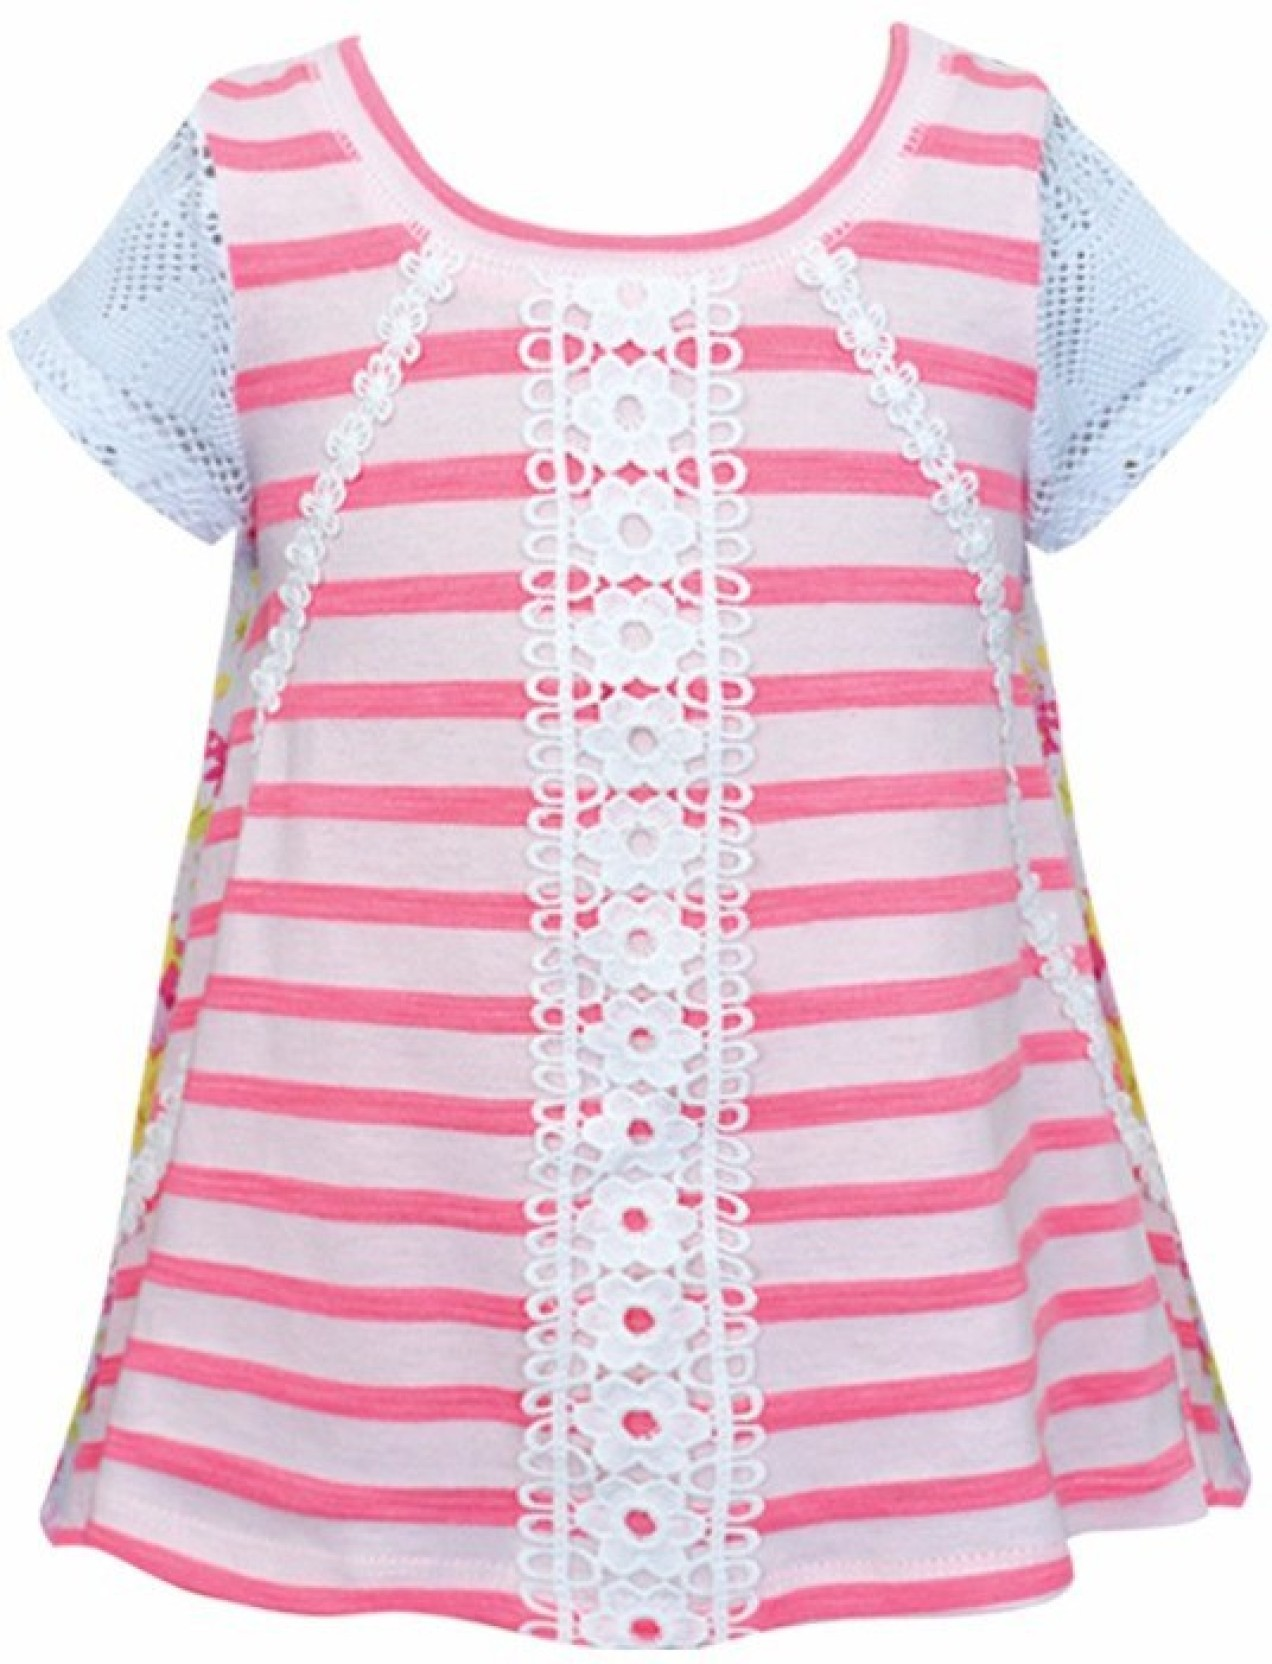 Baby Sara Girls Printed Polyester T Shirt Price in India Buy Baby